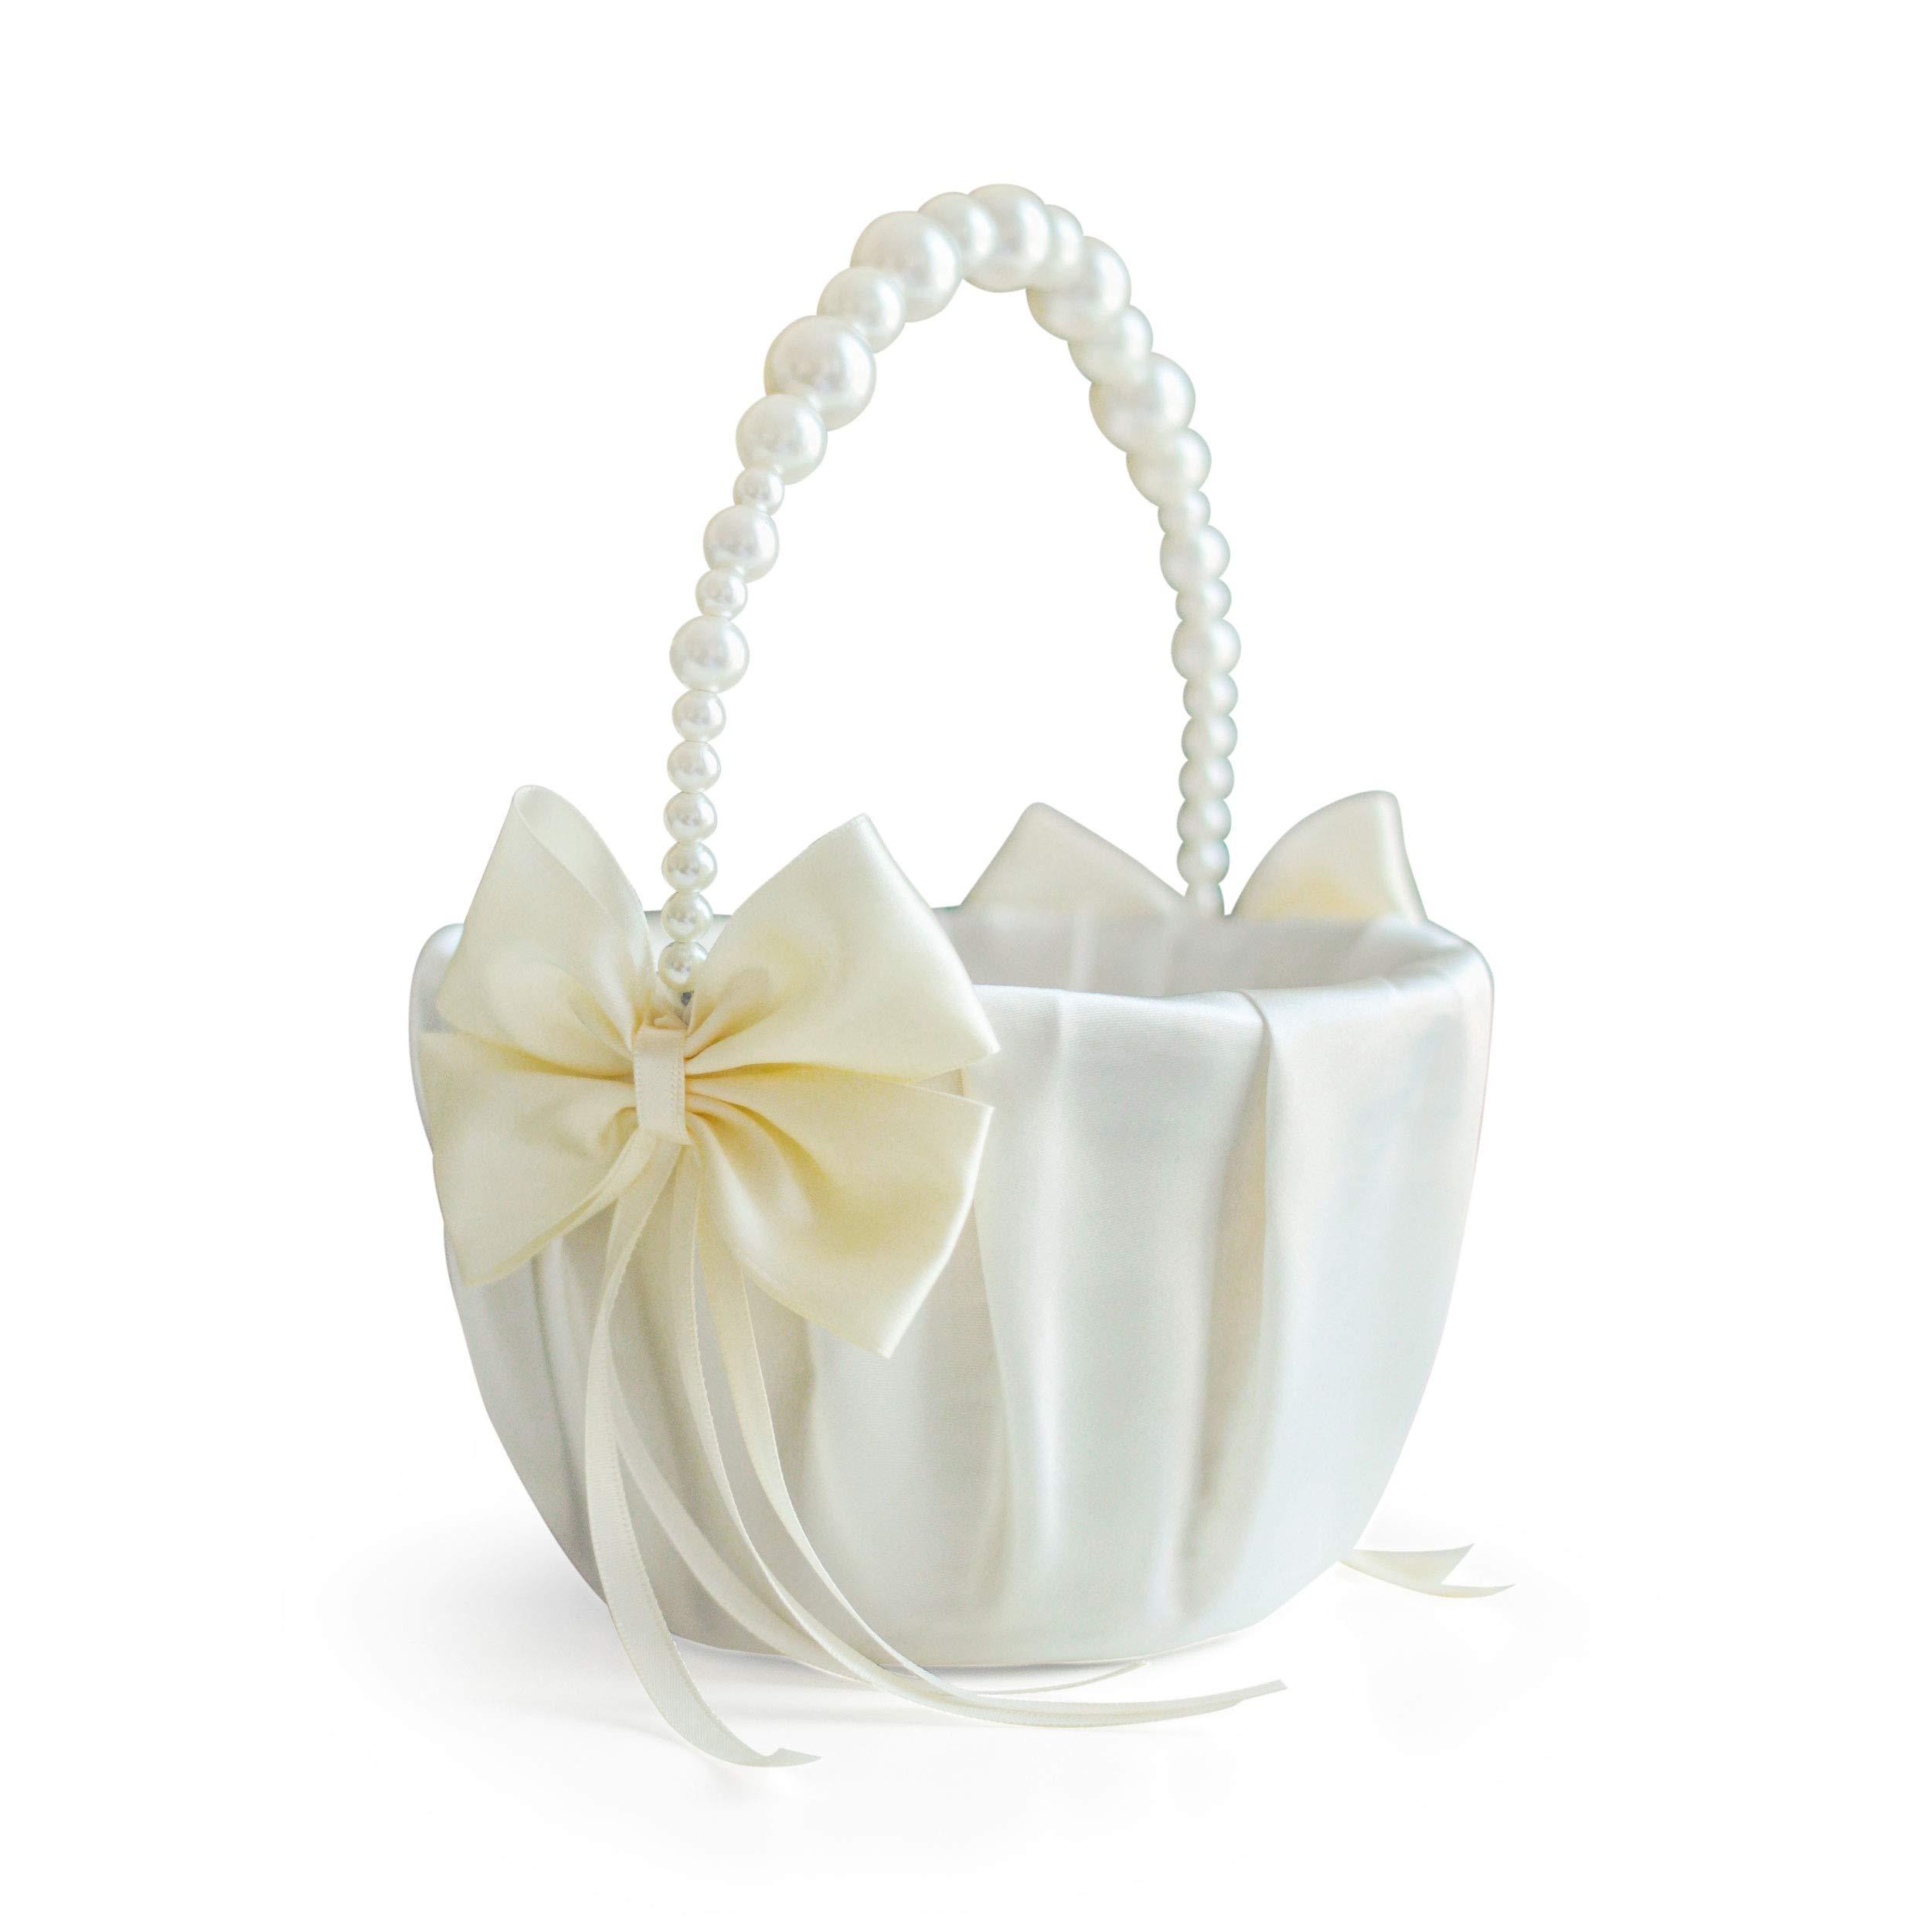 Alex Emotions Ivory Flower Girl Basket with Pearl Handle, Ivory Wedding Basket, Pearl Handle Basket, Ivory Flower Baskets